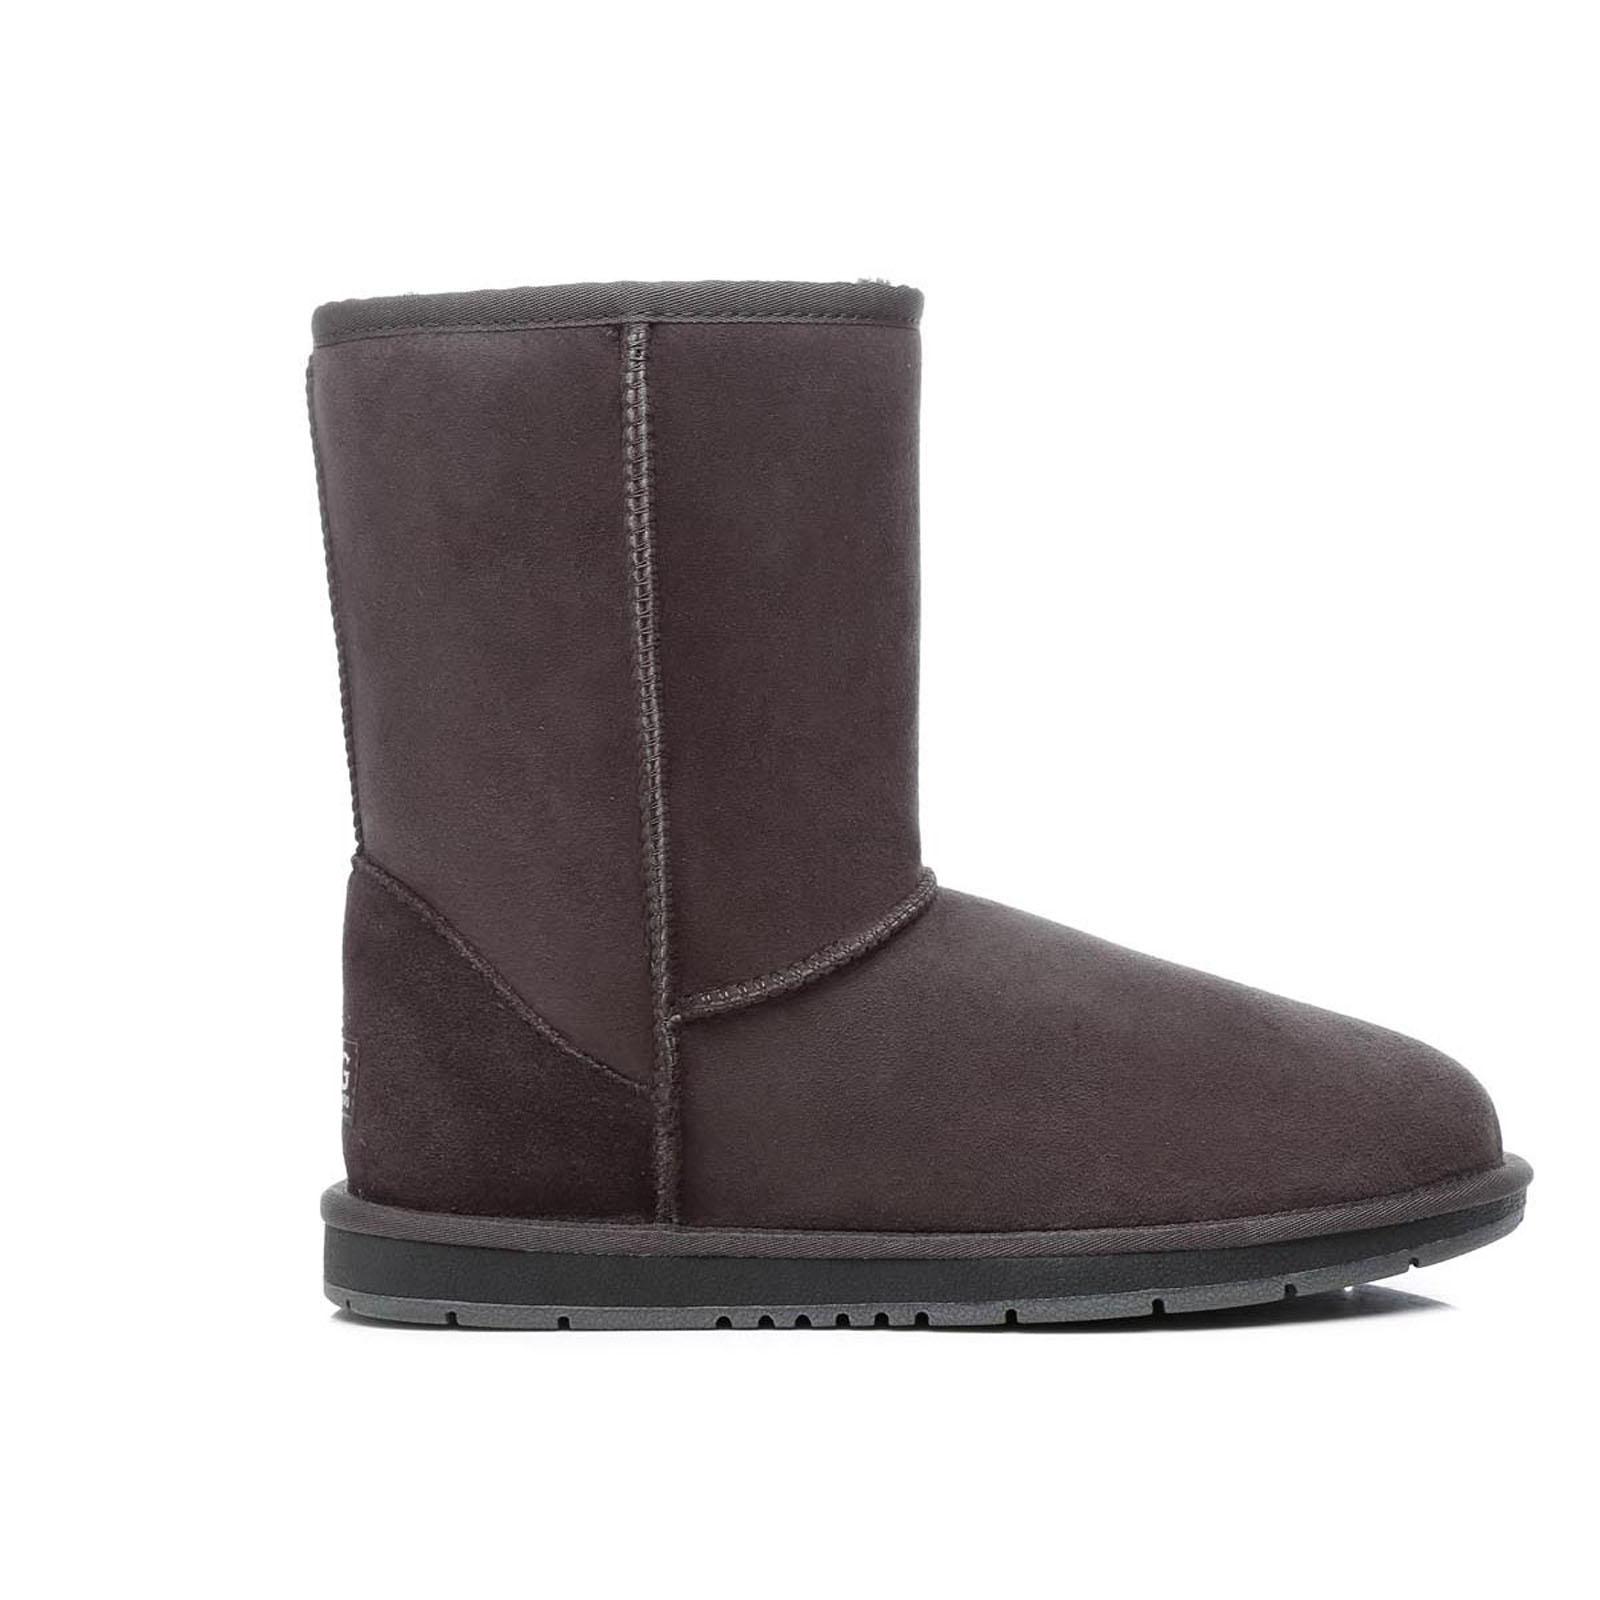 Ugg-Boots-Women-Men-Classic-Short-Australian-Sheepskin-Water-Resistant-Outdoor